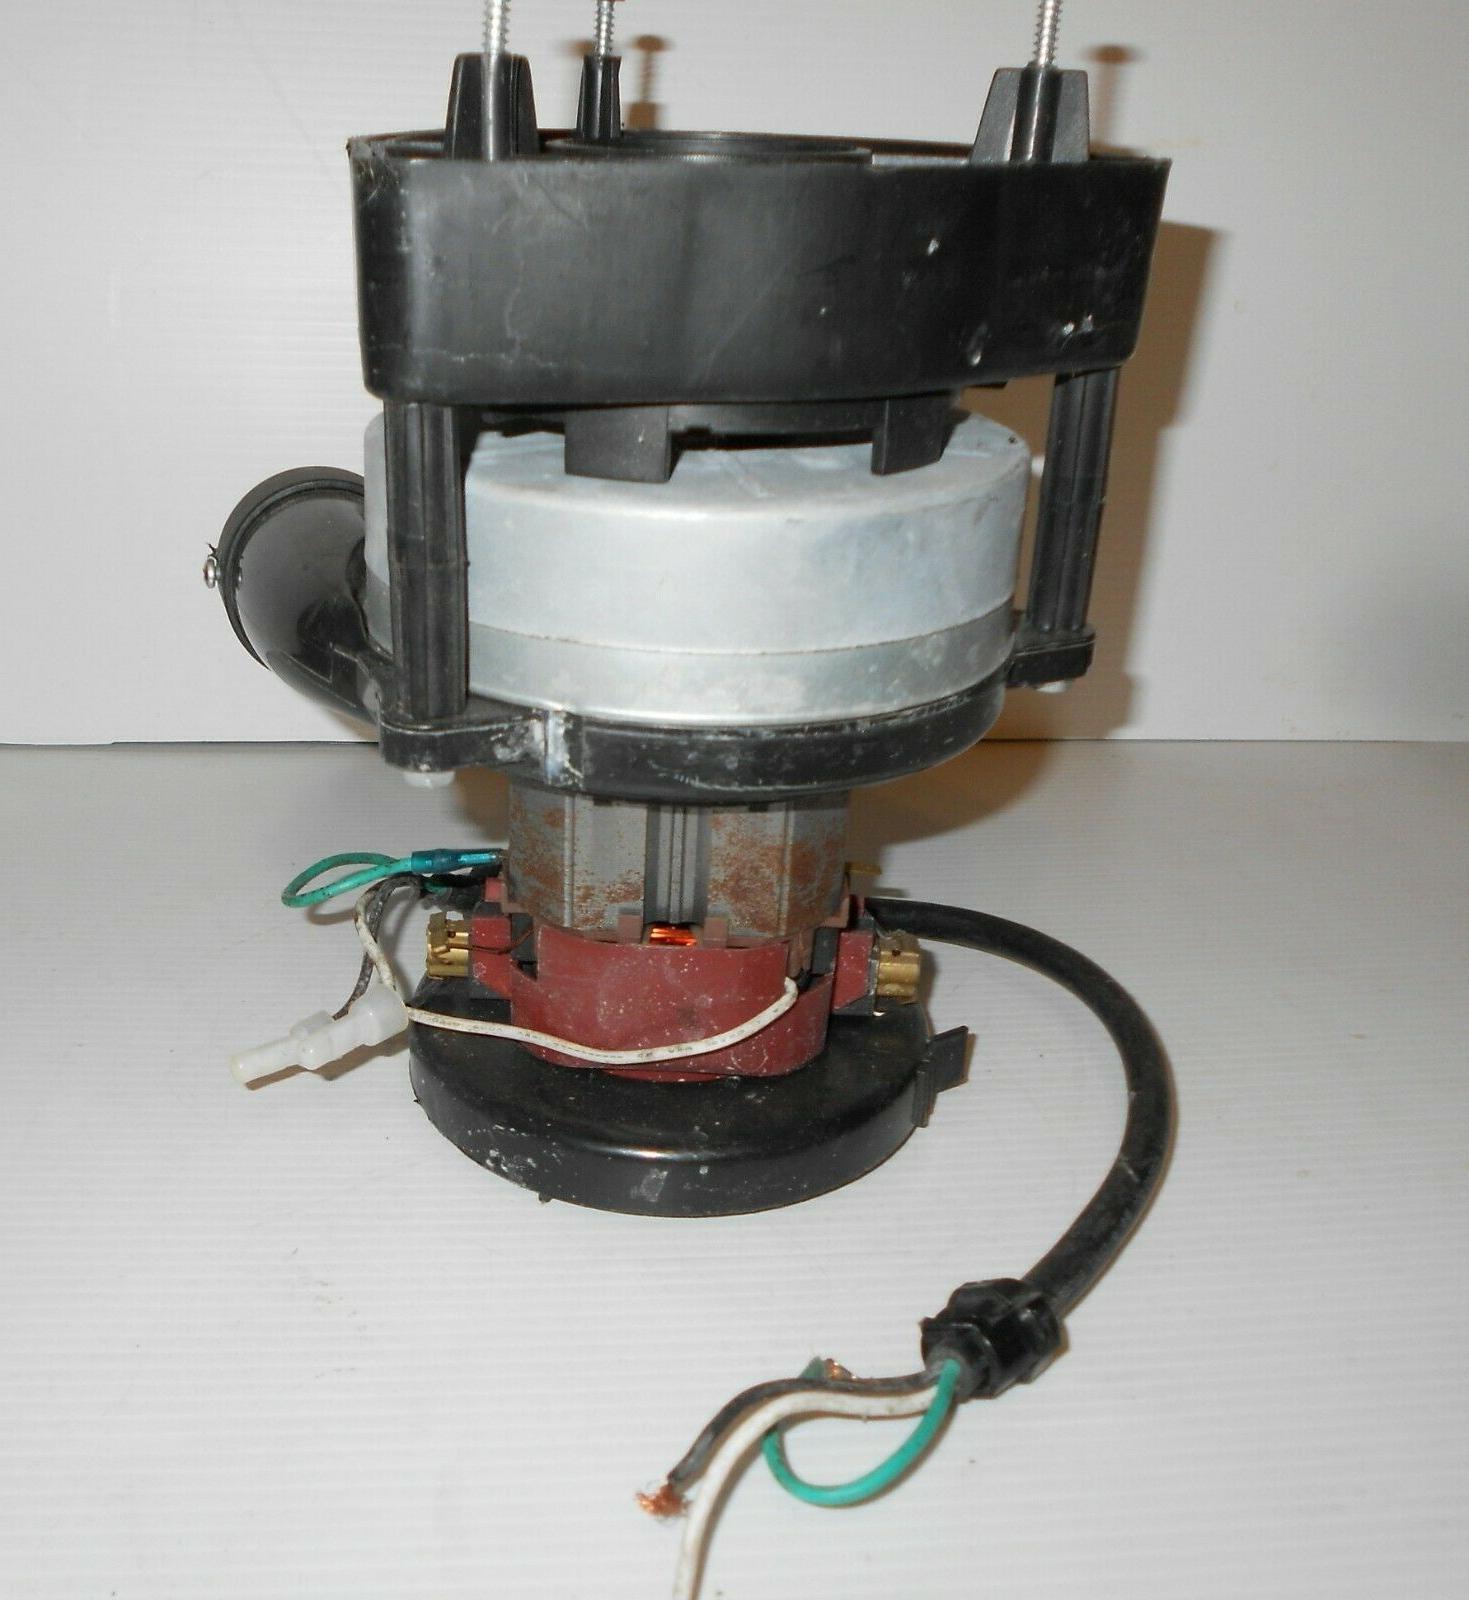 ryobi m4910 20 paint sprayer blower assembly